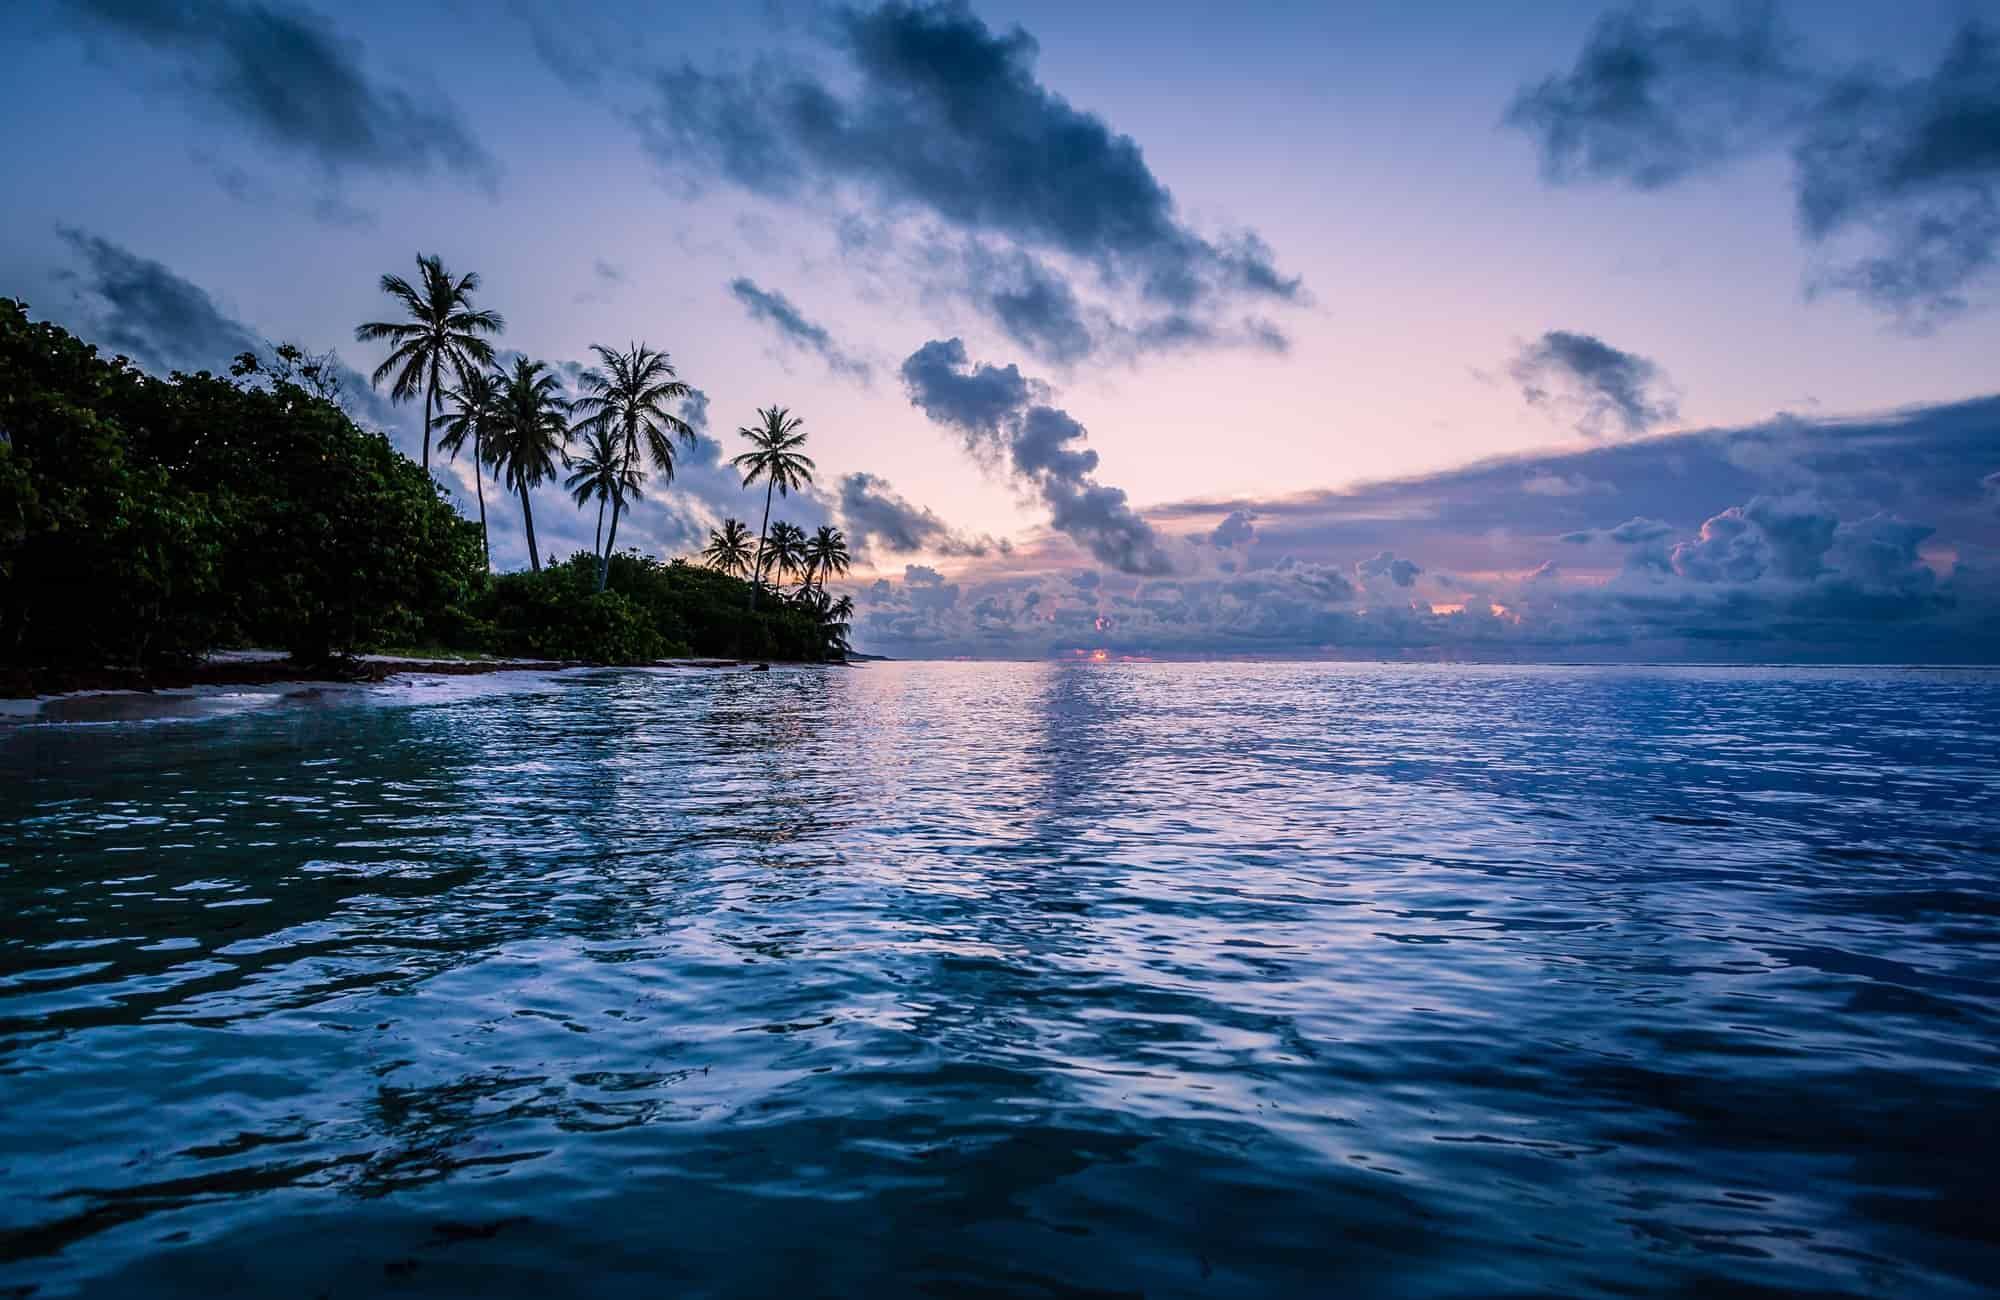 Voyage Guadeloupe - Sainte Anne - Amplitudes